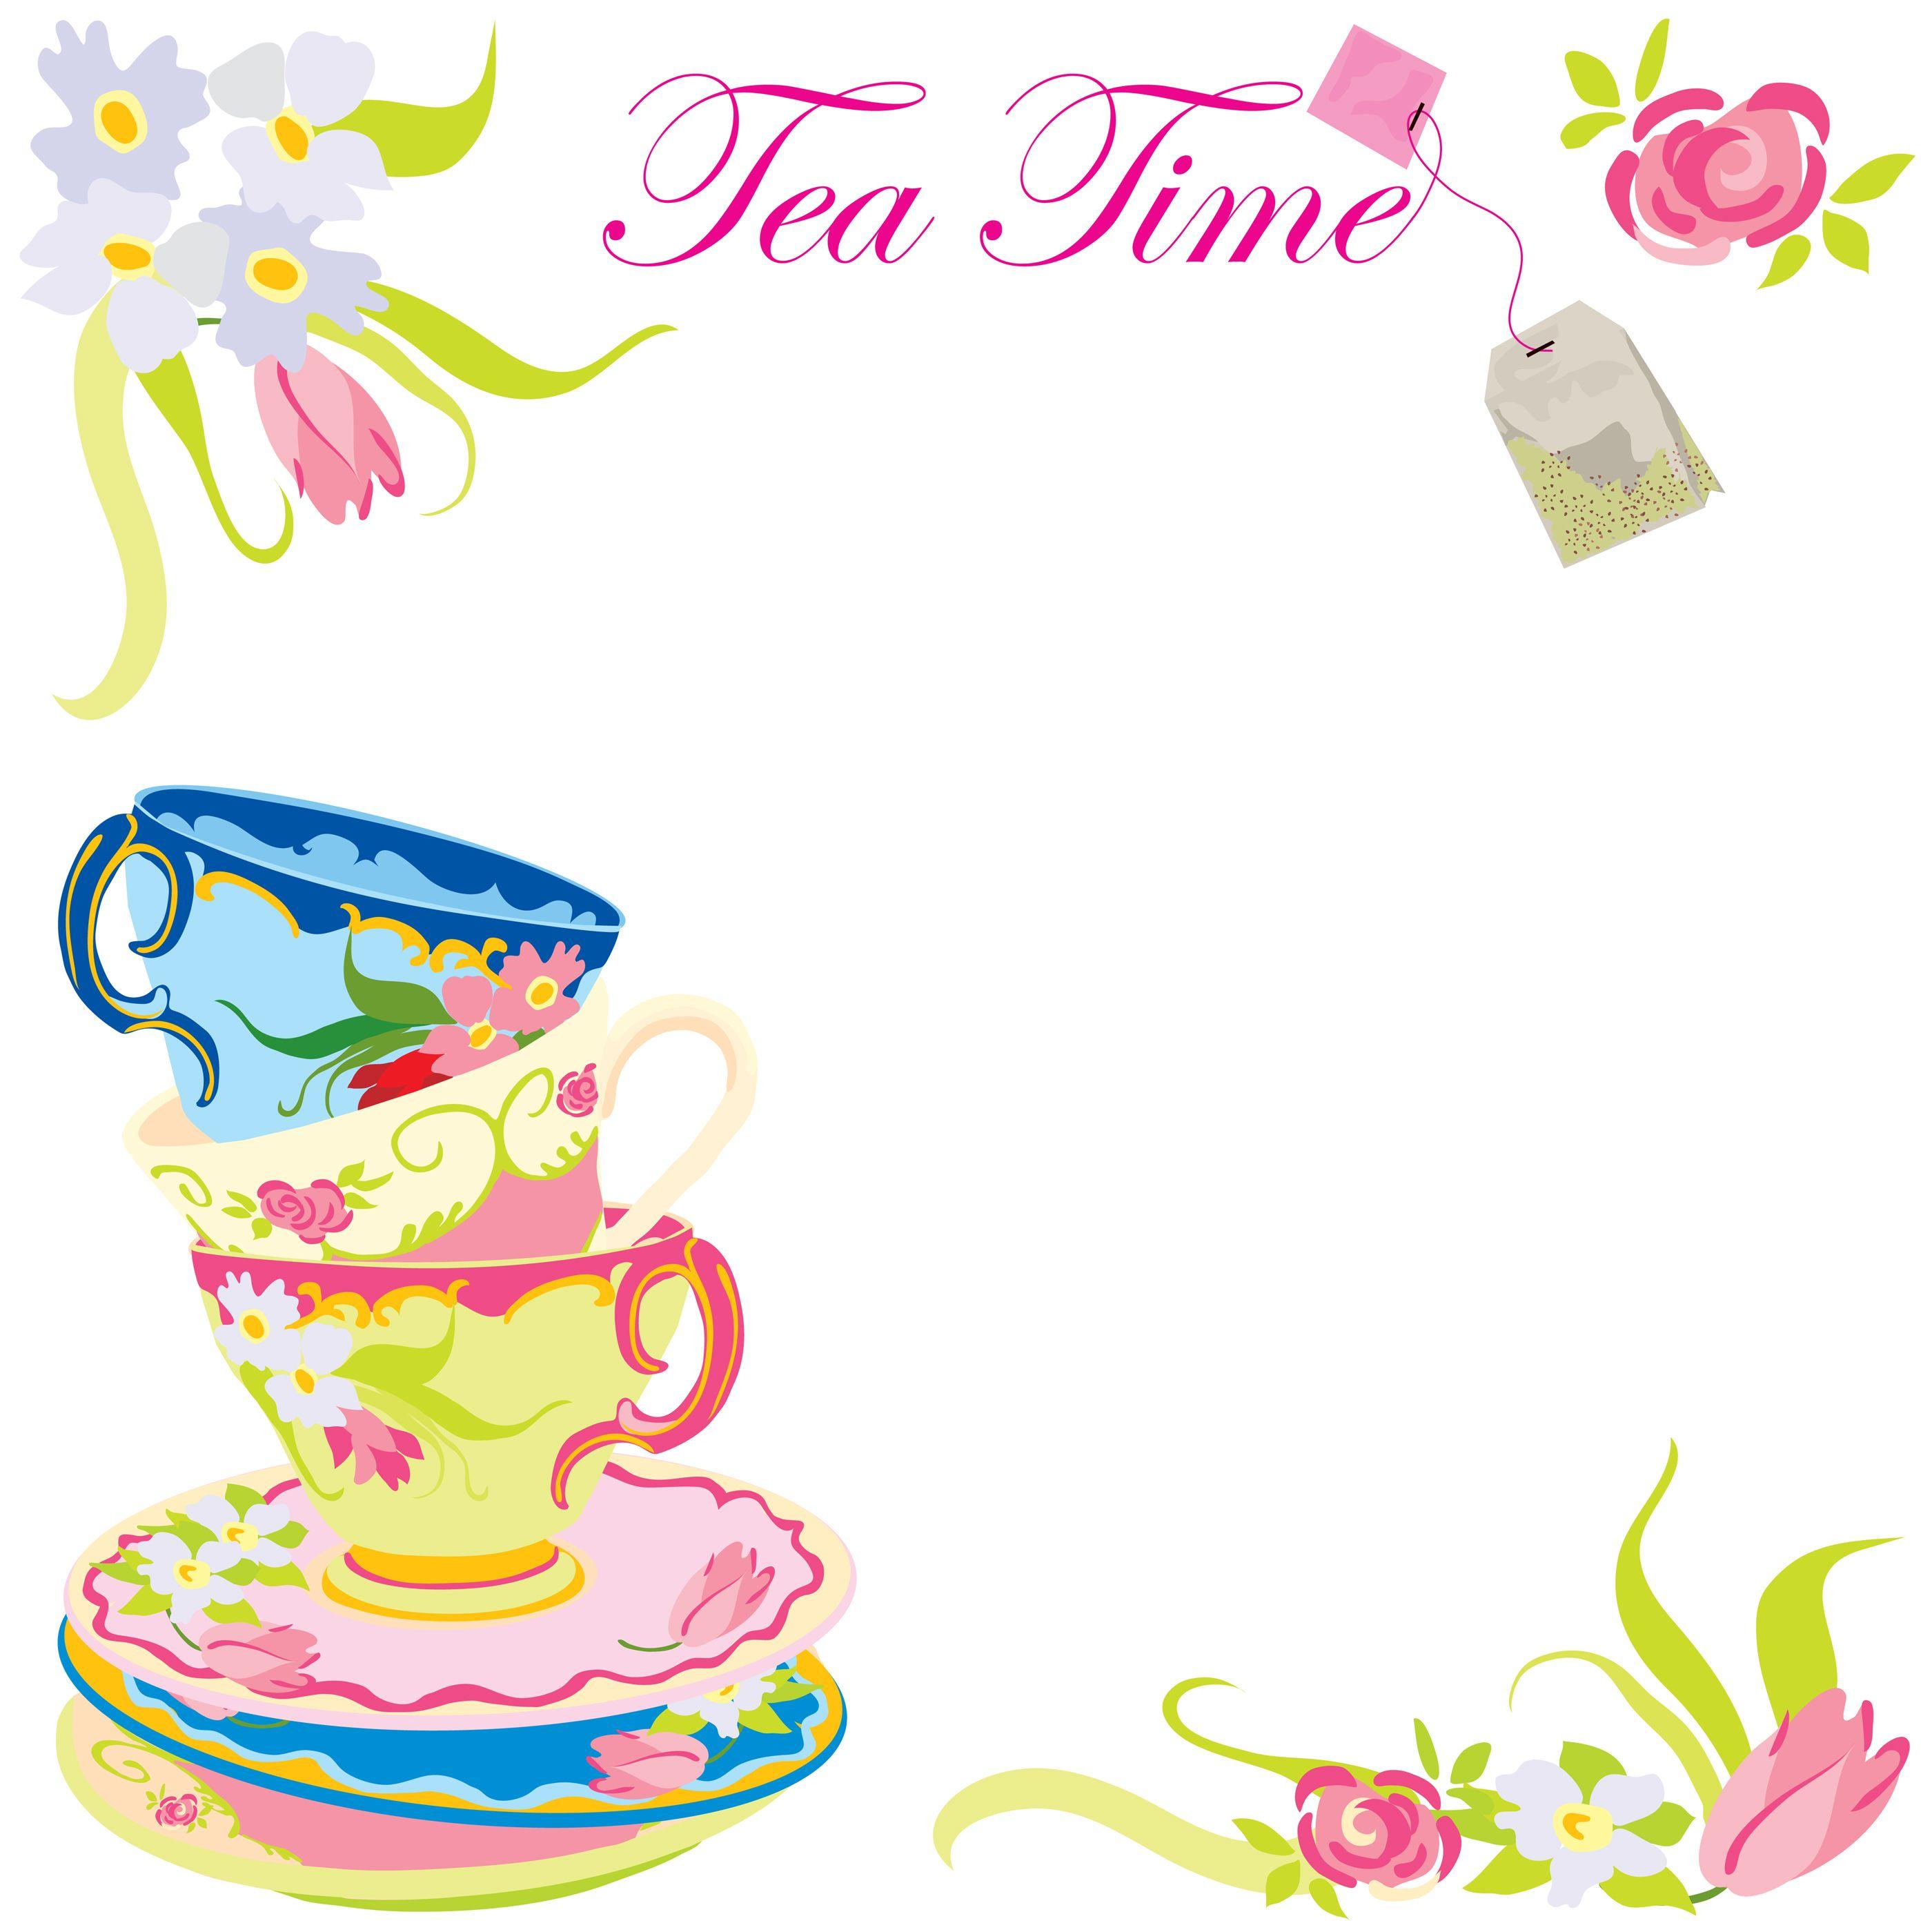 2800x2800 Tea Cups For Tea Party Birthday Theme! Description